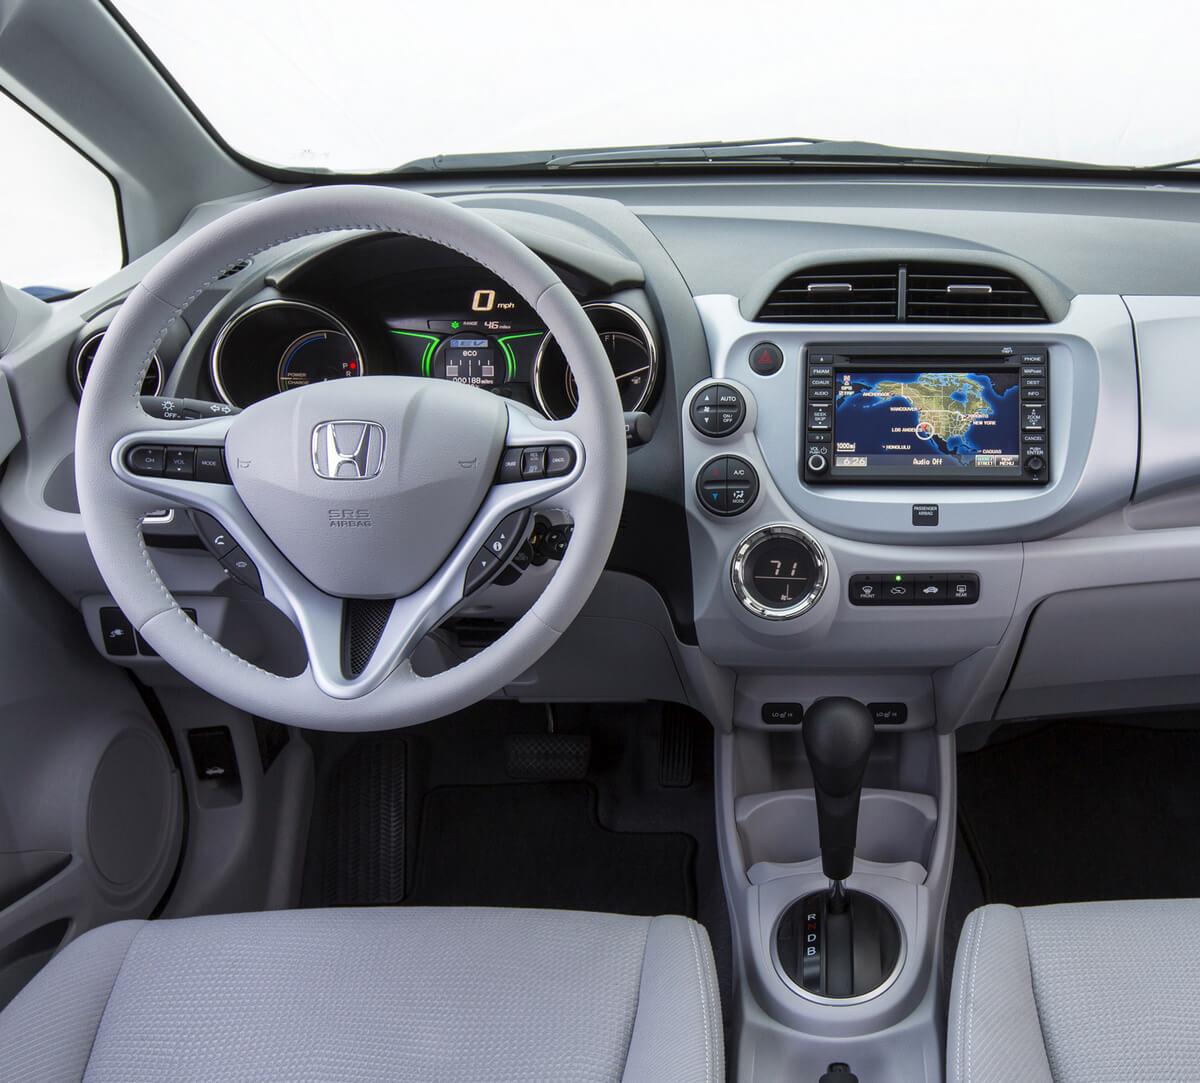 Honda Fit EV interior 2013 2014